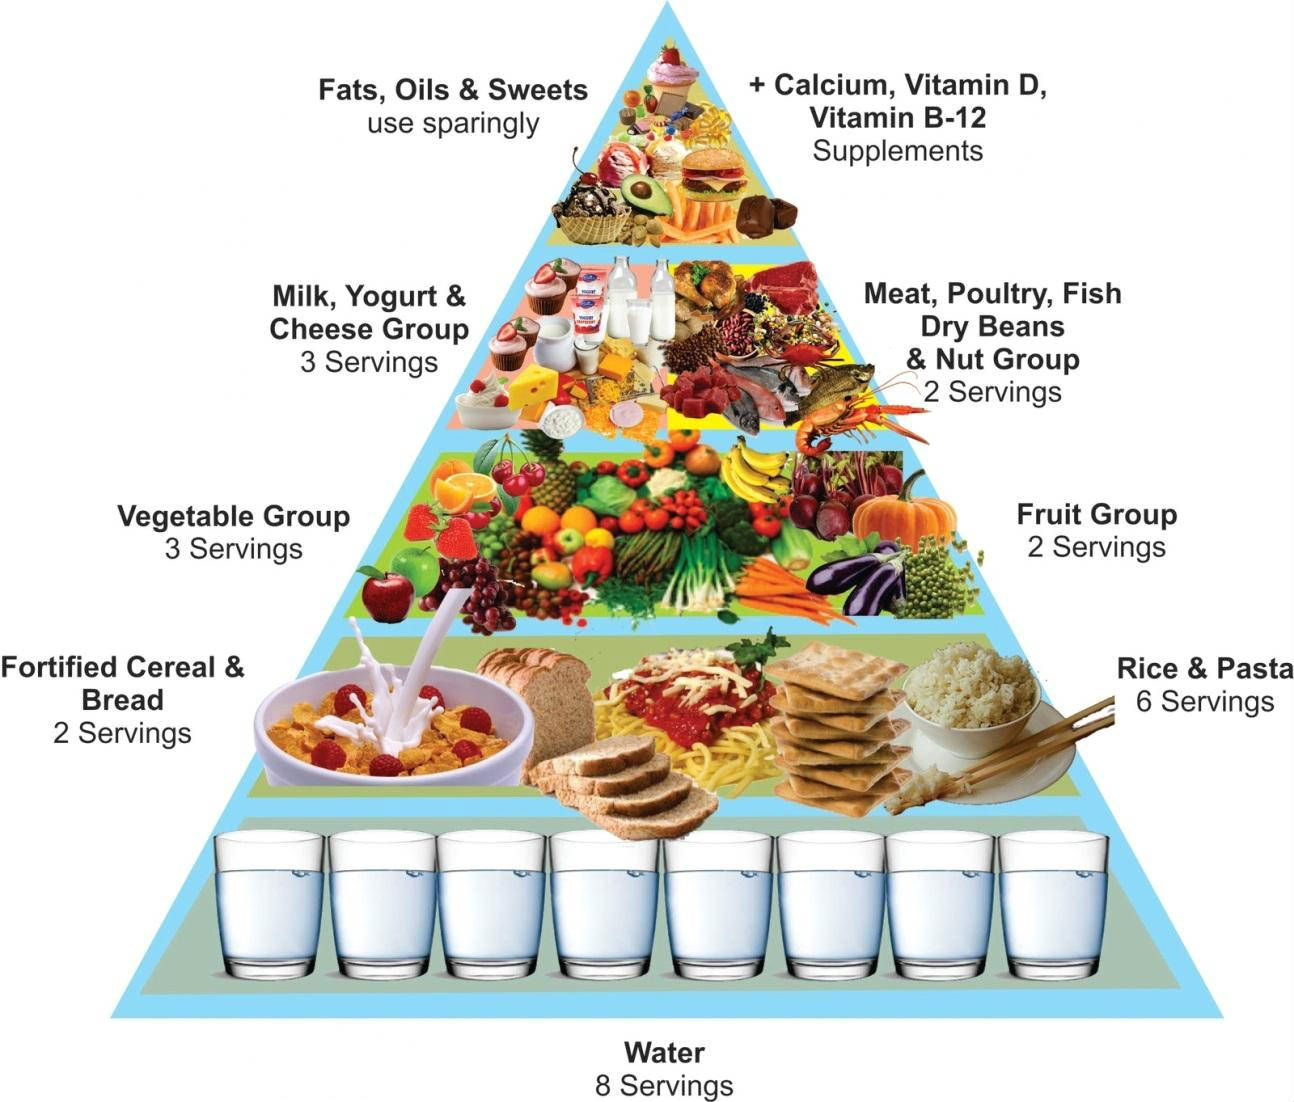 canada food guide pyramid 2015